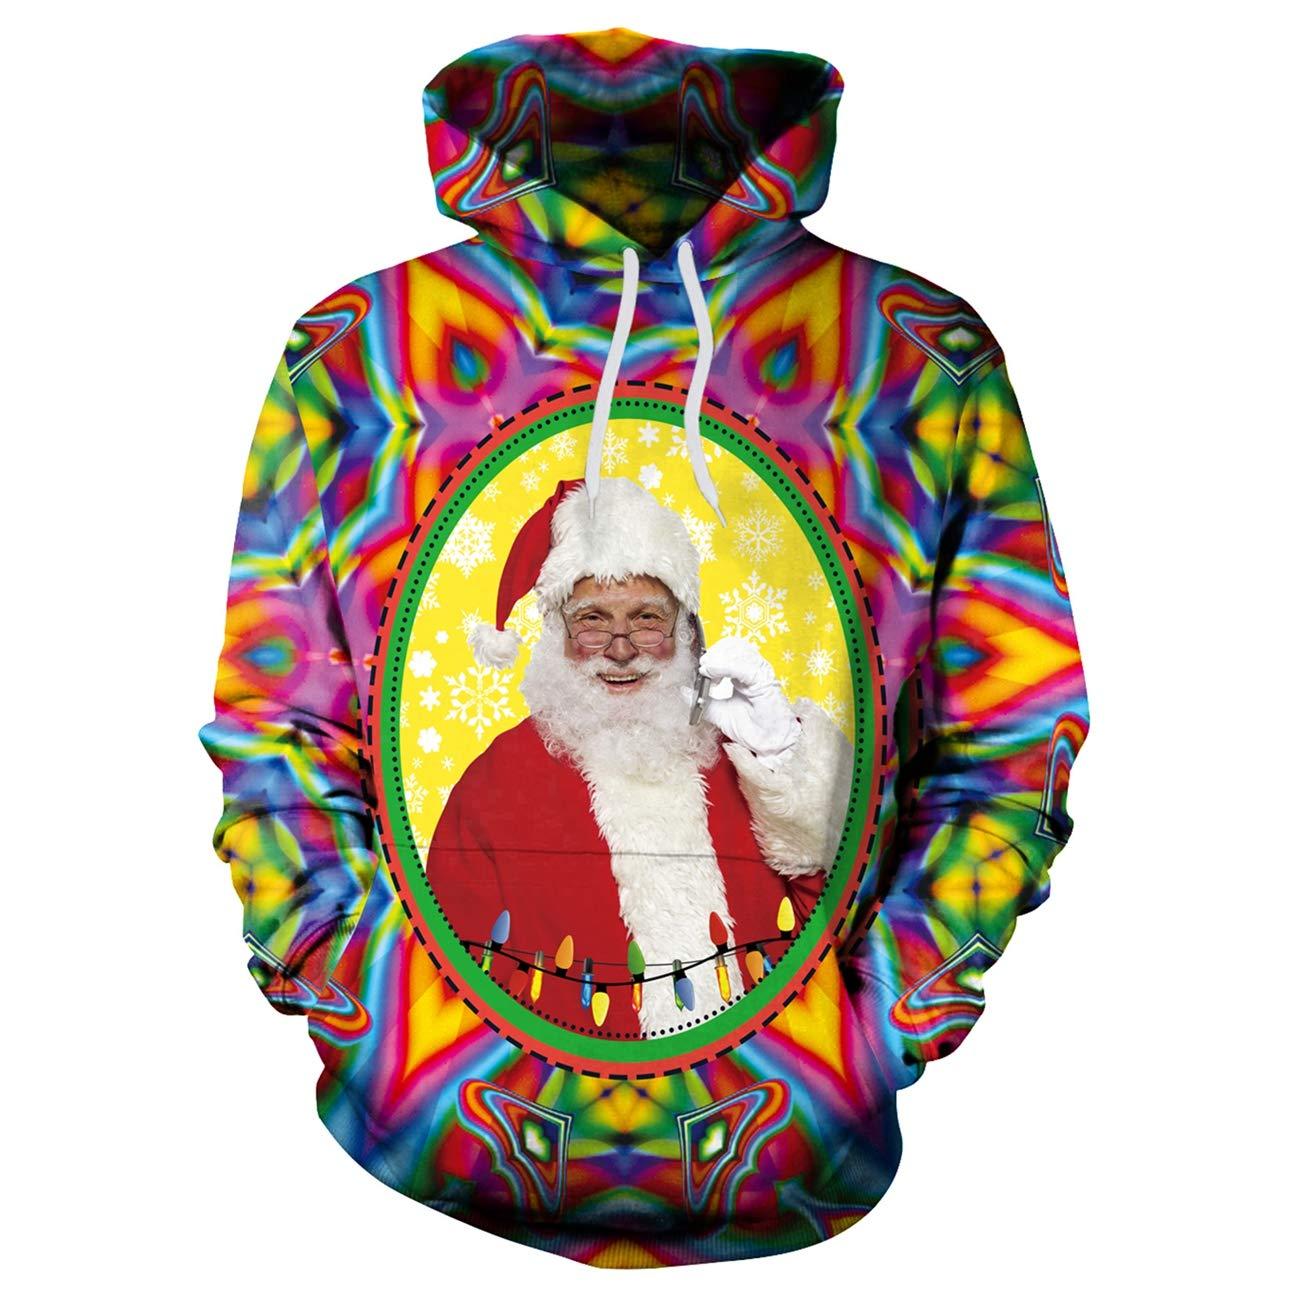 Minishion Womens Drawstring Santa Printed Color Christmas Sweater Shirt Hooded Top